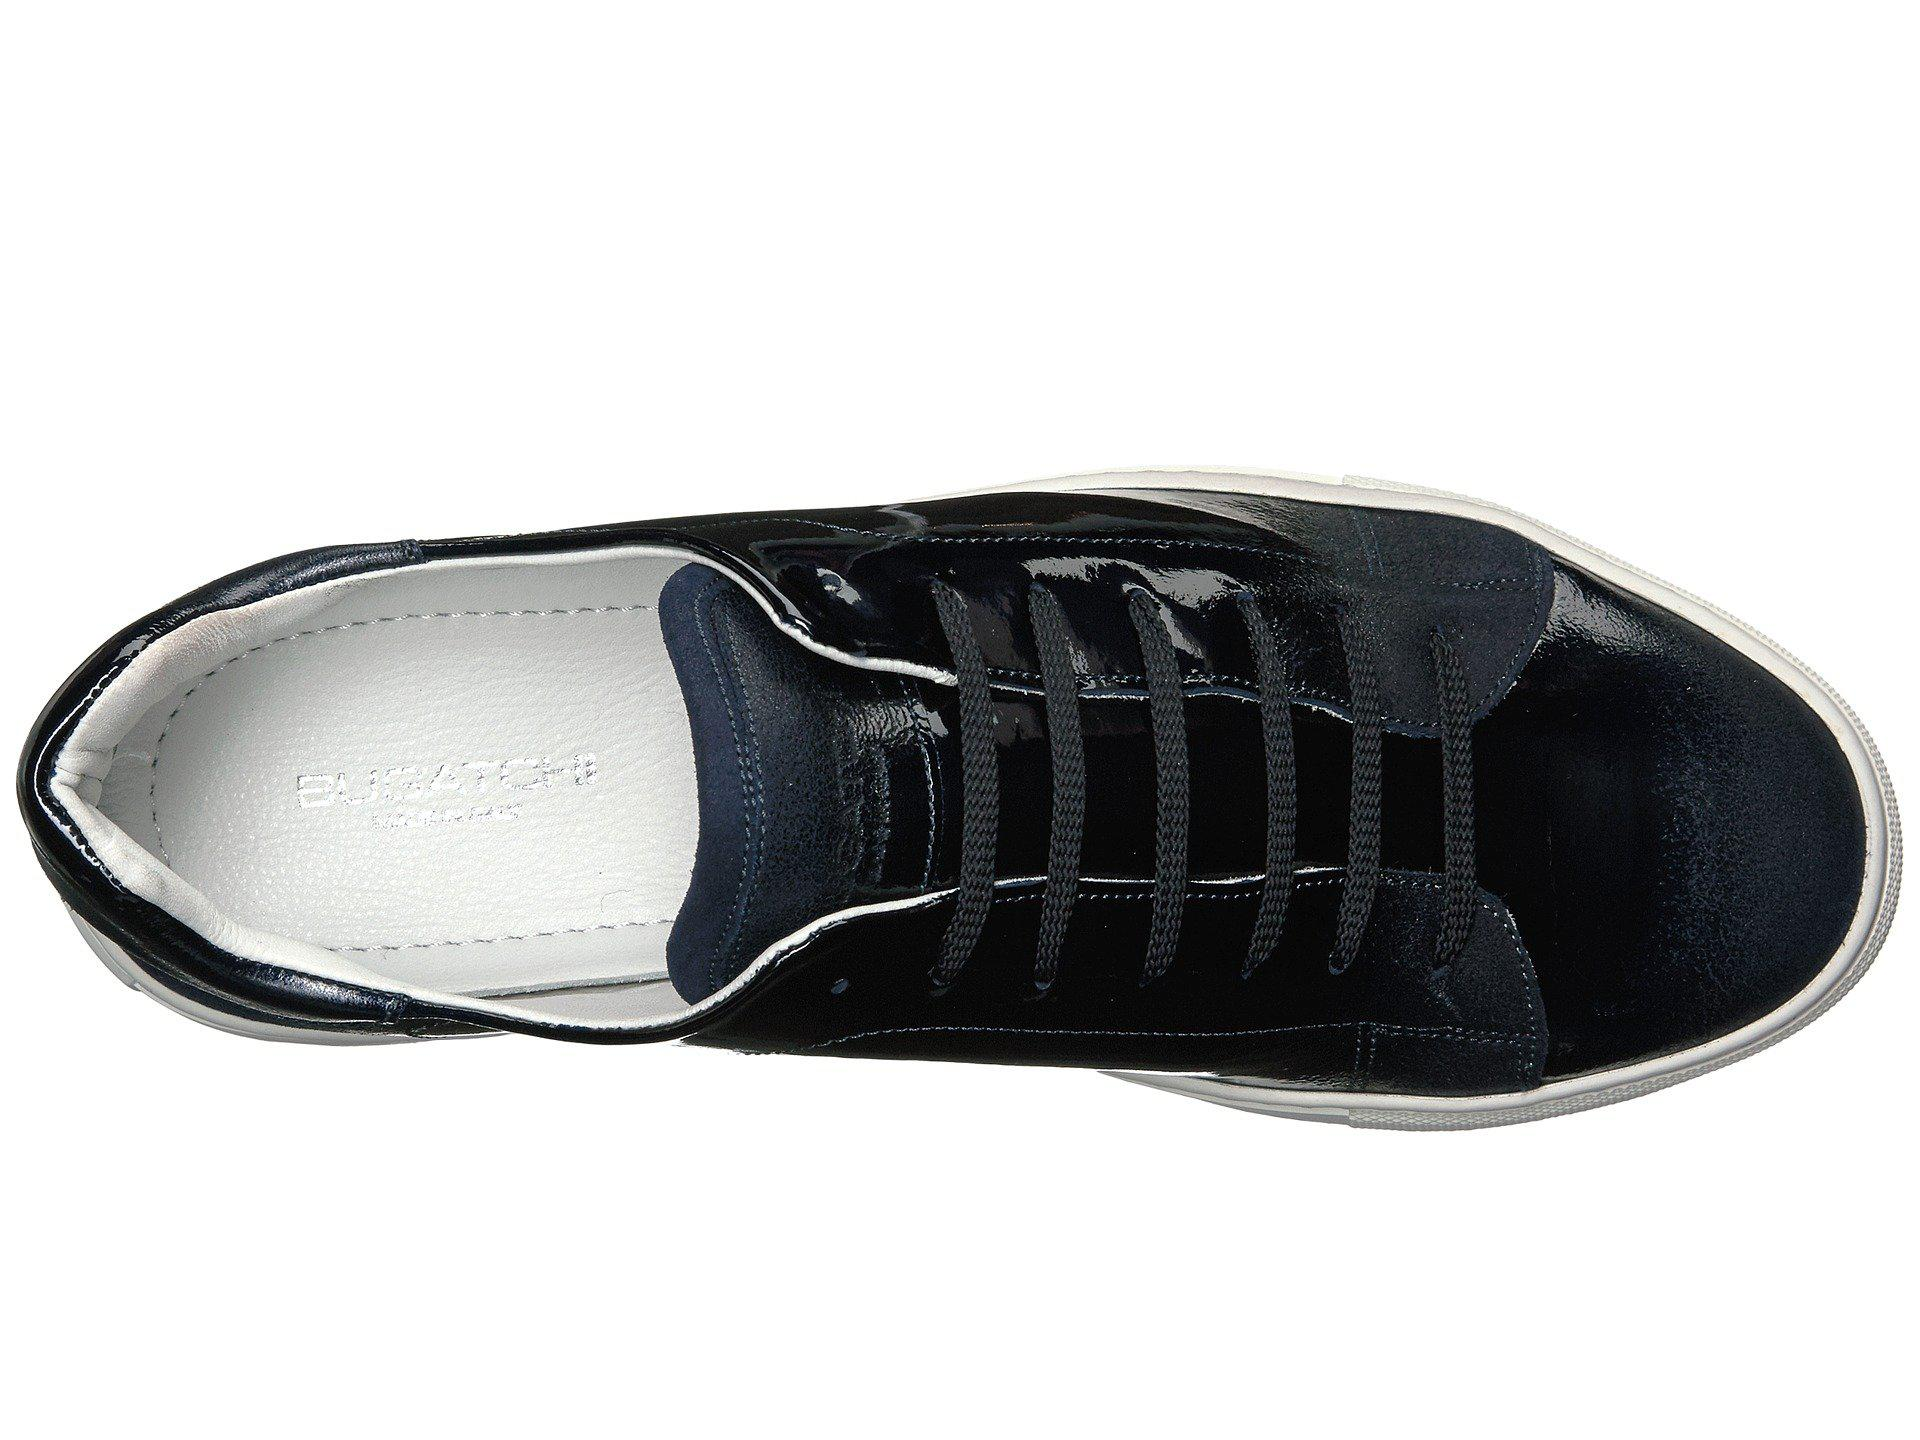 40544811ec27 Bugatchi - Blue South Beach Sneaker for Men - Lyst. View fullscreen